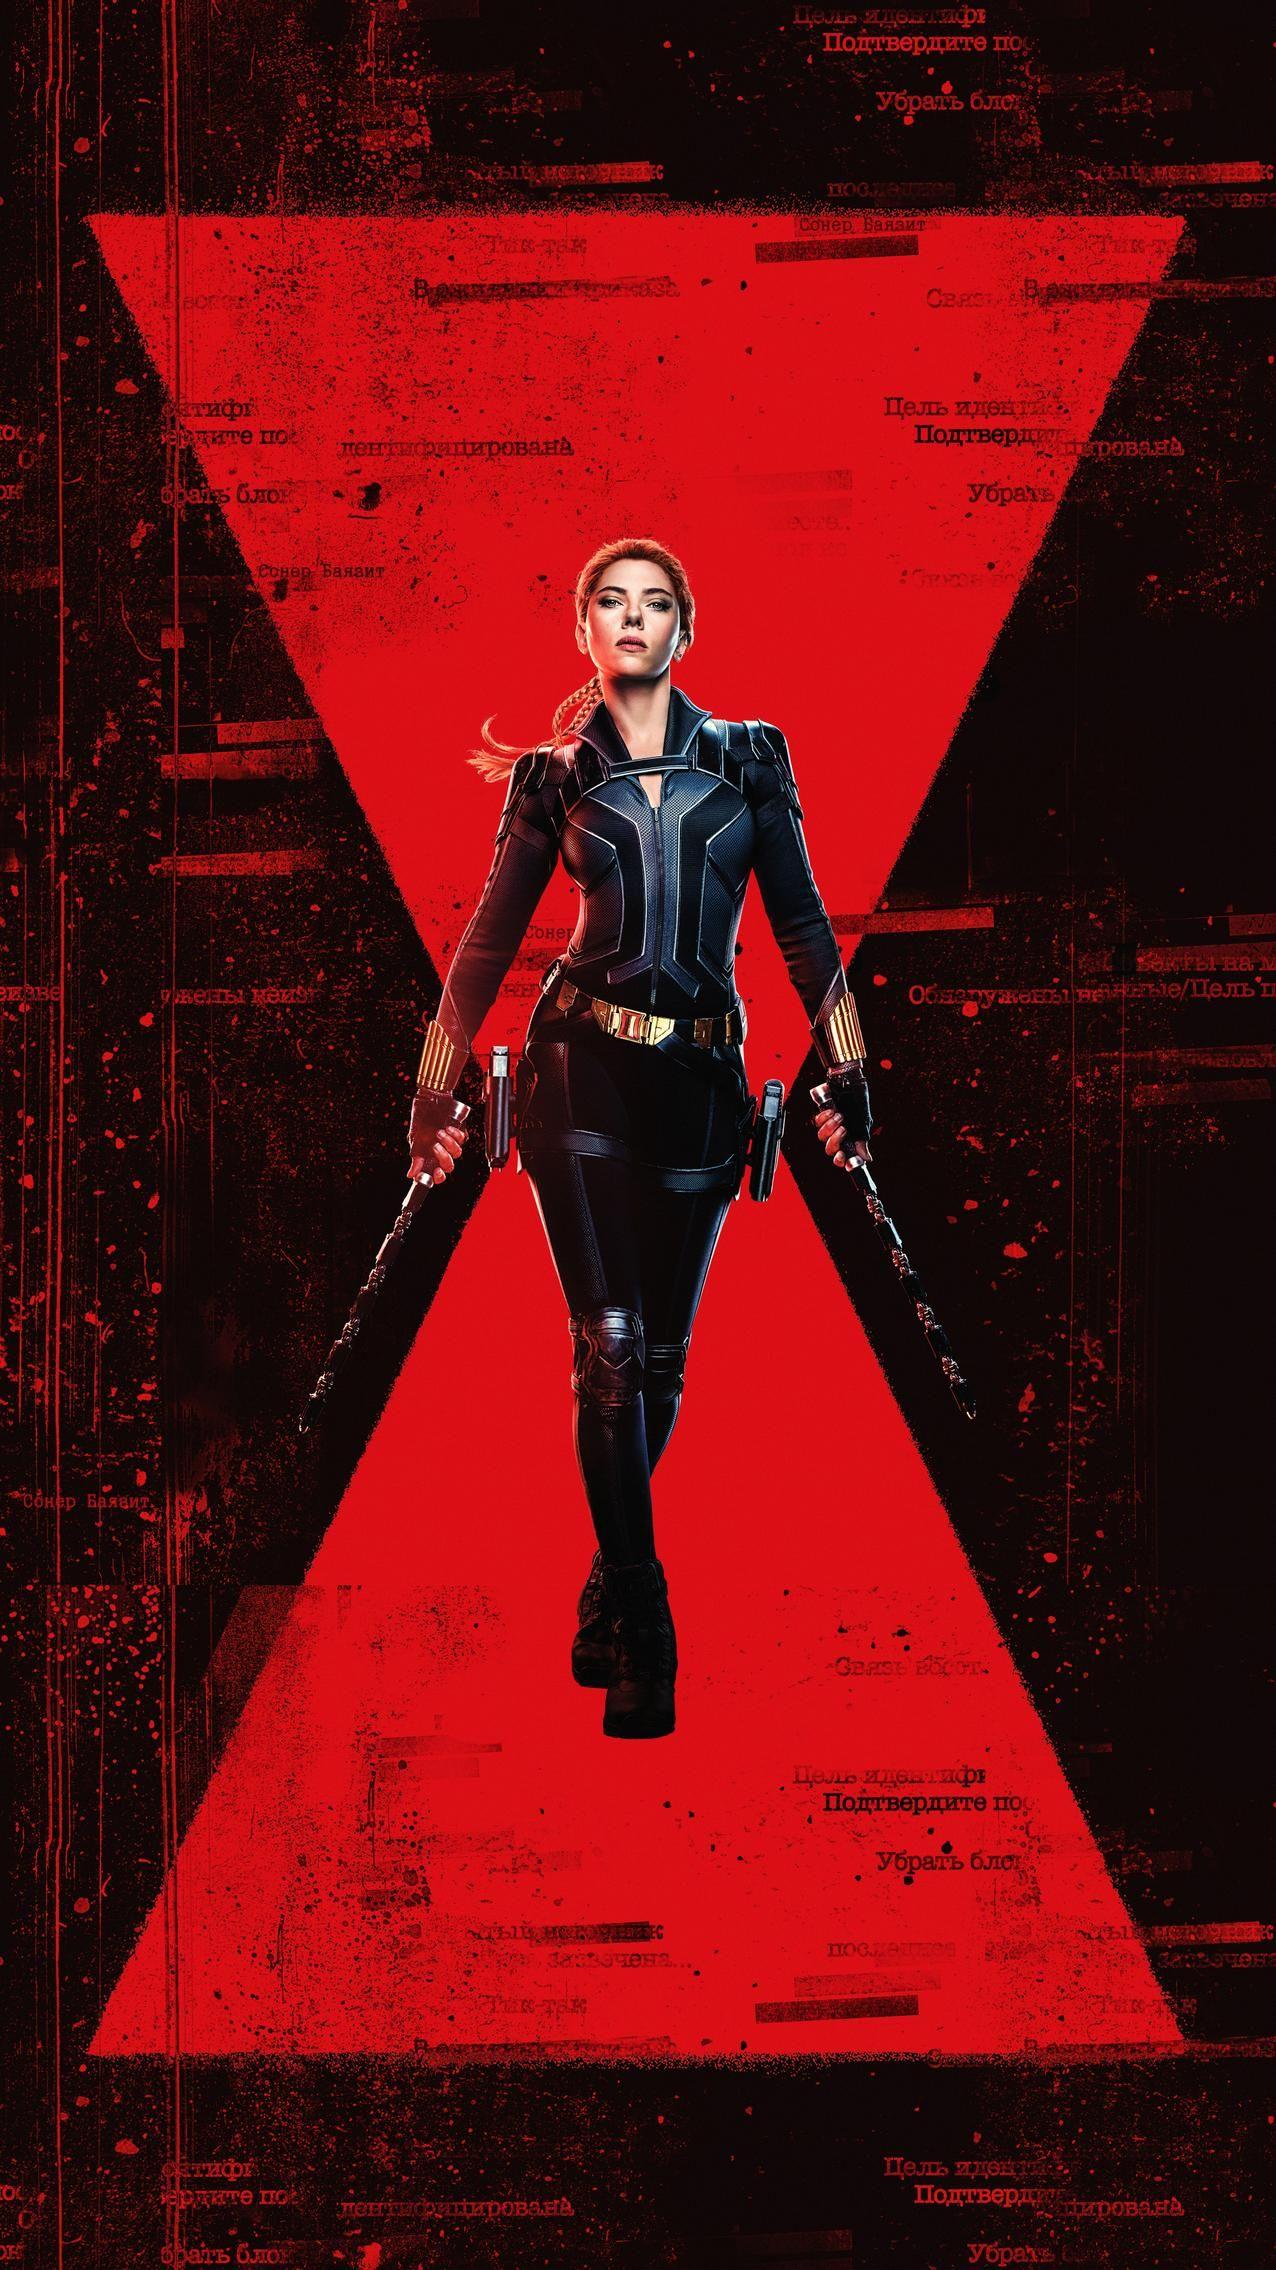 Black Widow 2021 Phone Wallpaper Moviemania Black Widow Marvel Black Widow Avengers Black Widow Wallpaper